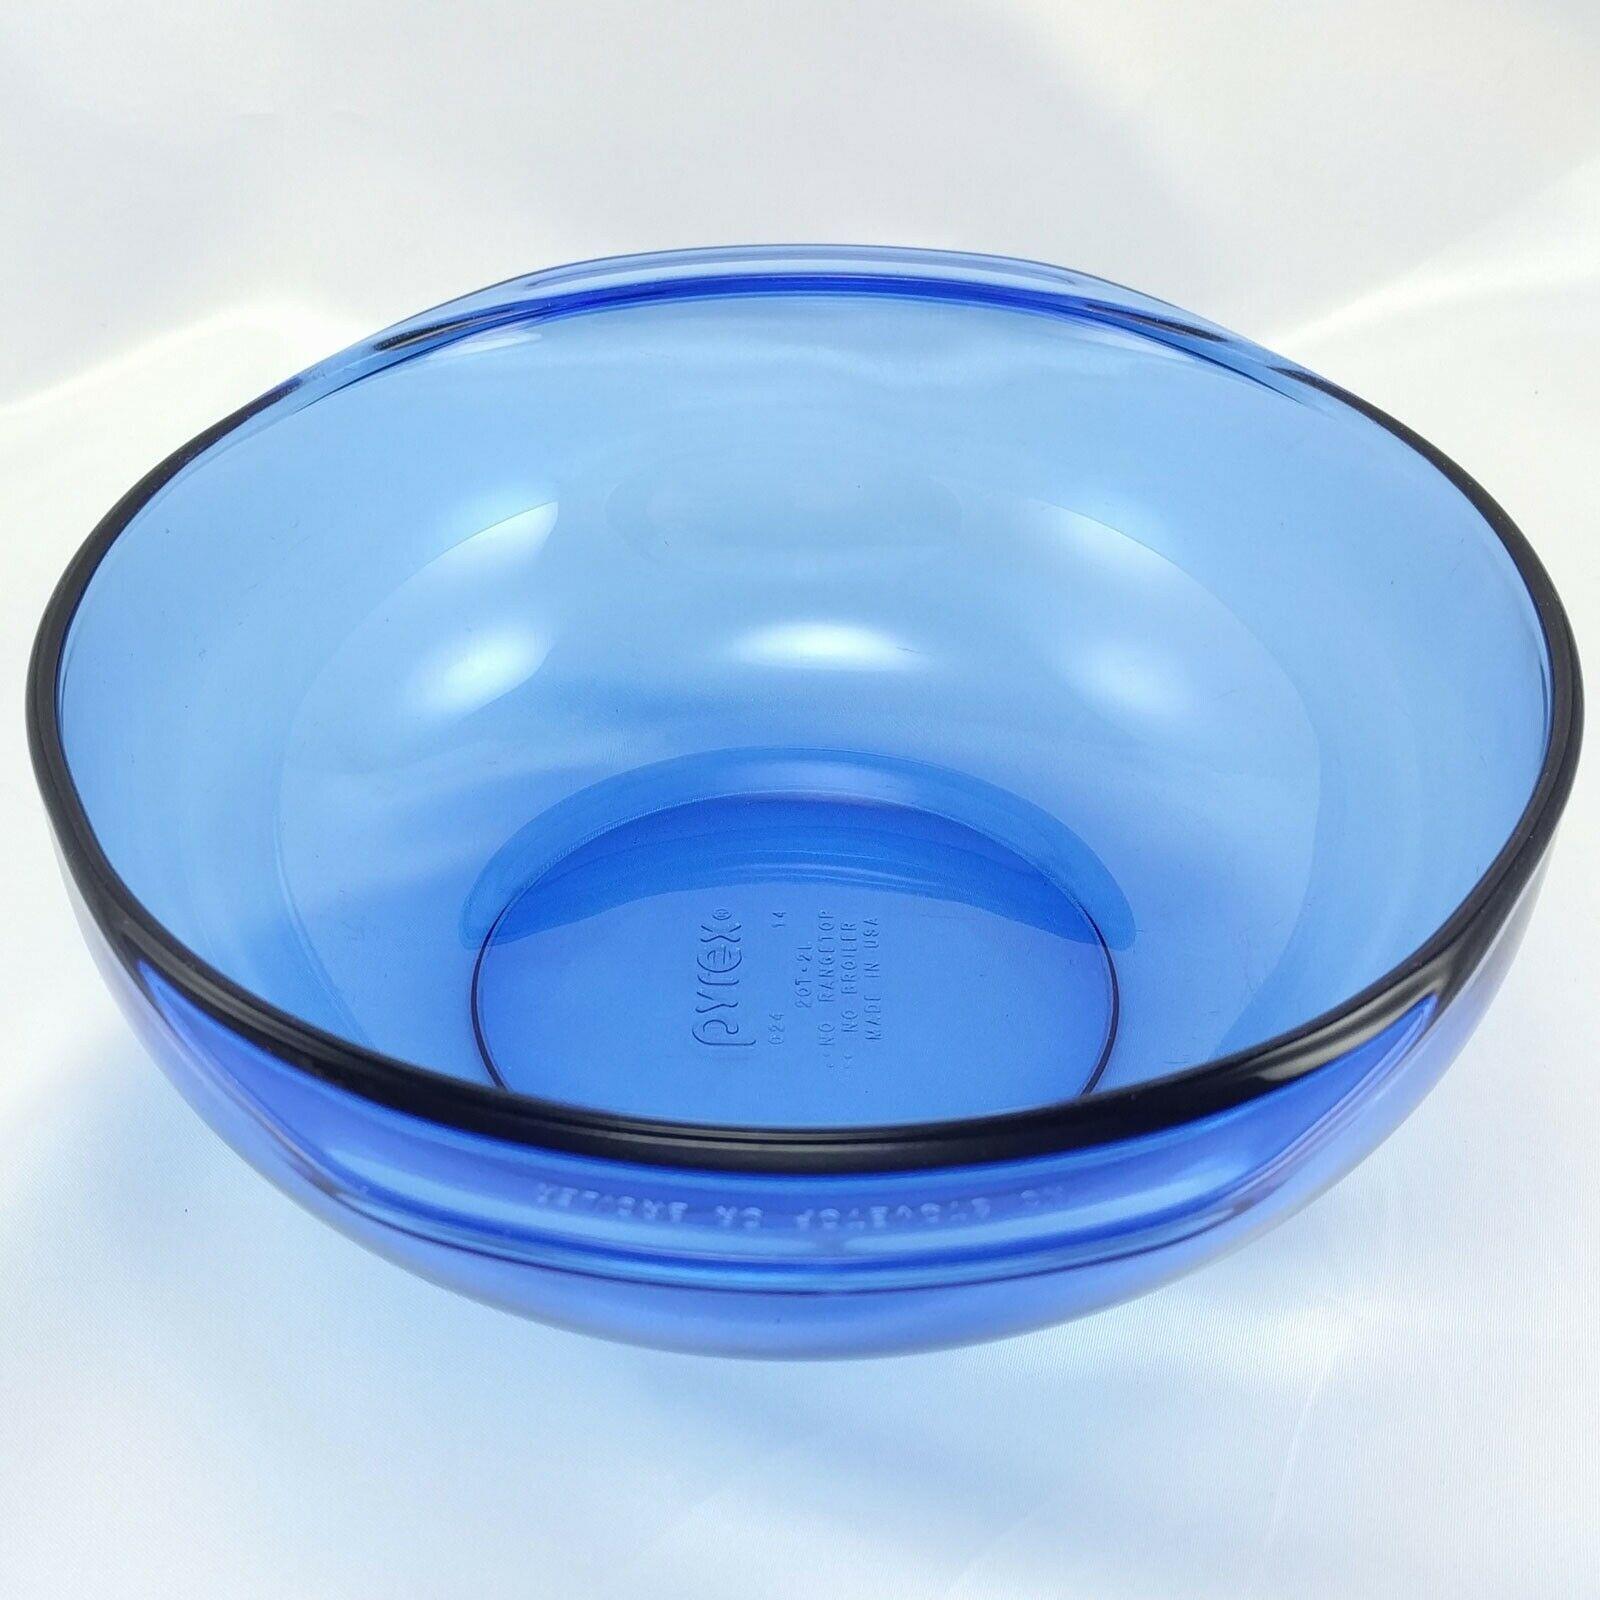 Pyrex 024 Cobalt Blue Bowl 2 qt Serving Casserole w/ 024C Lid Made in the USA image 2